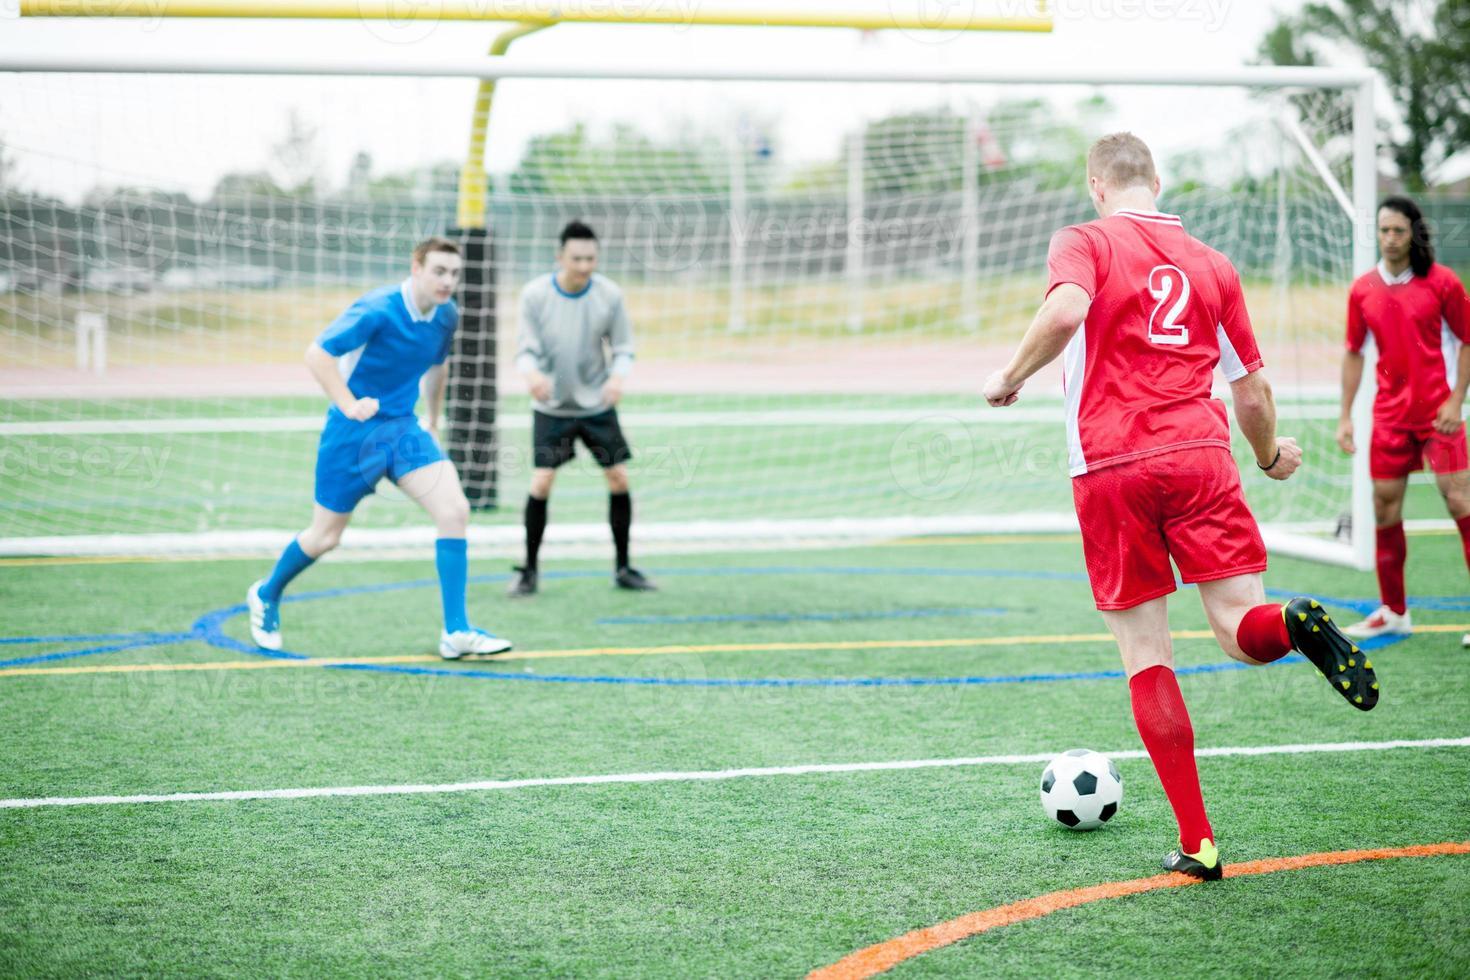 Soccer (football) players photo